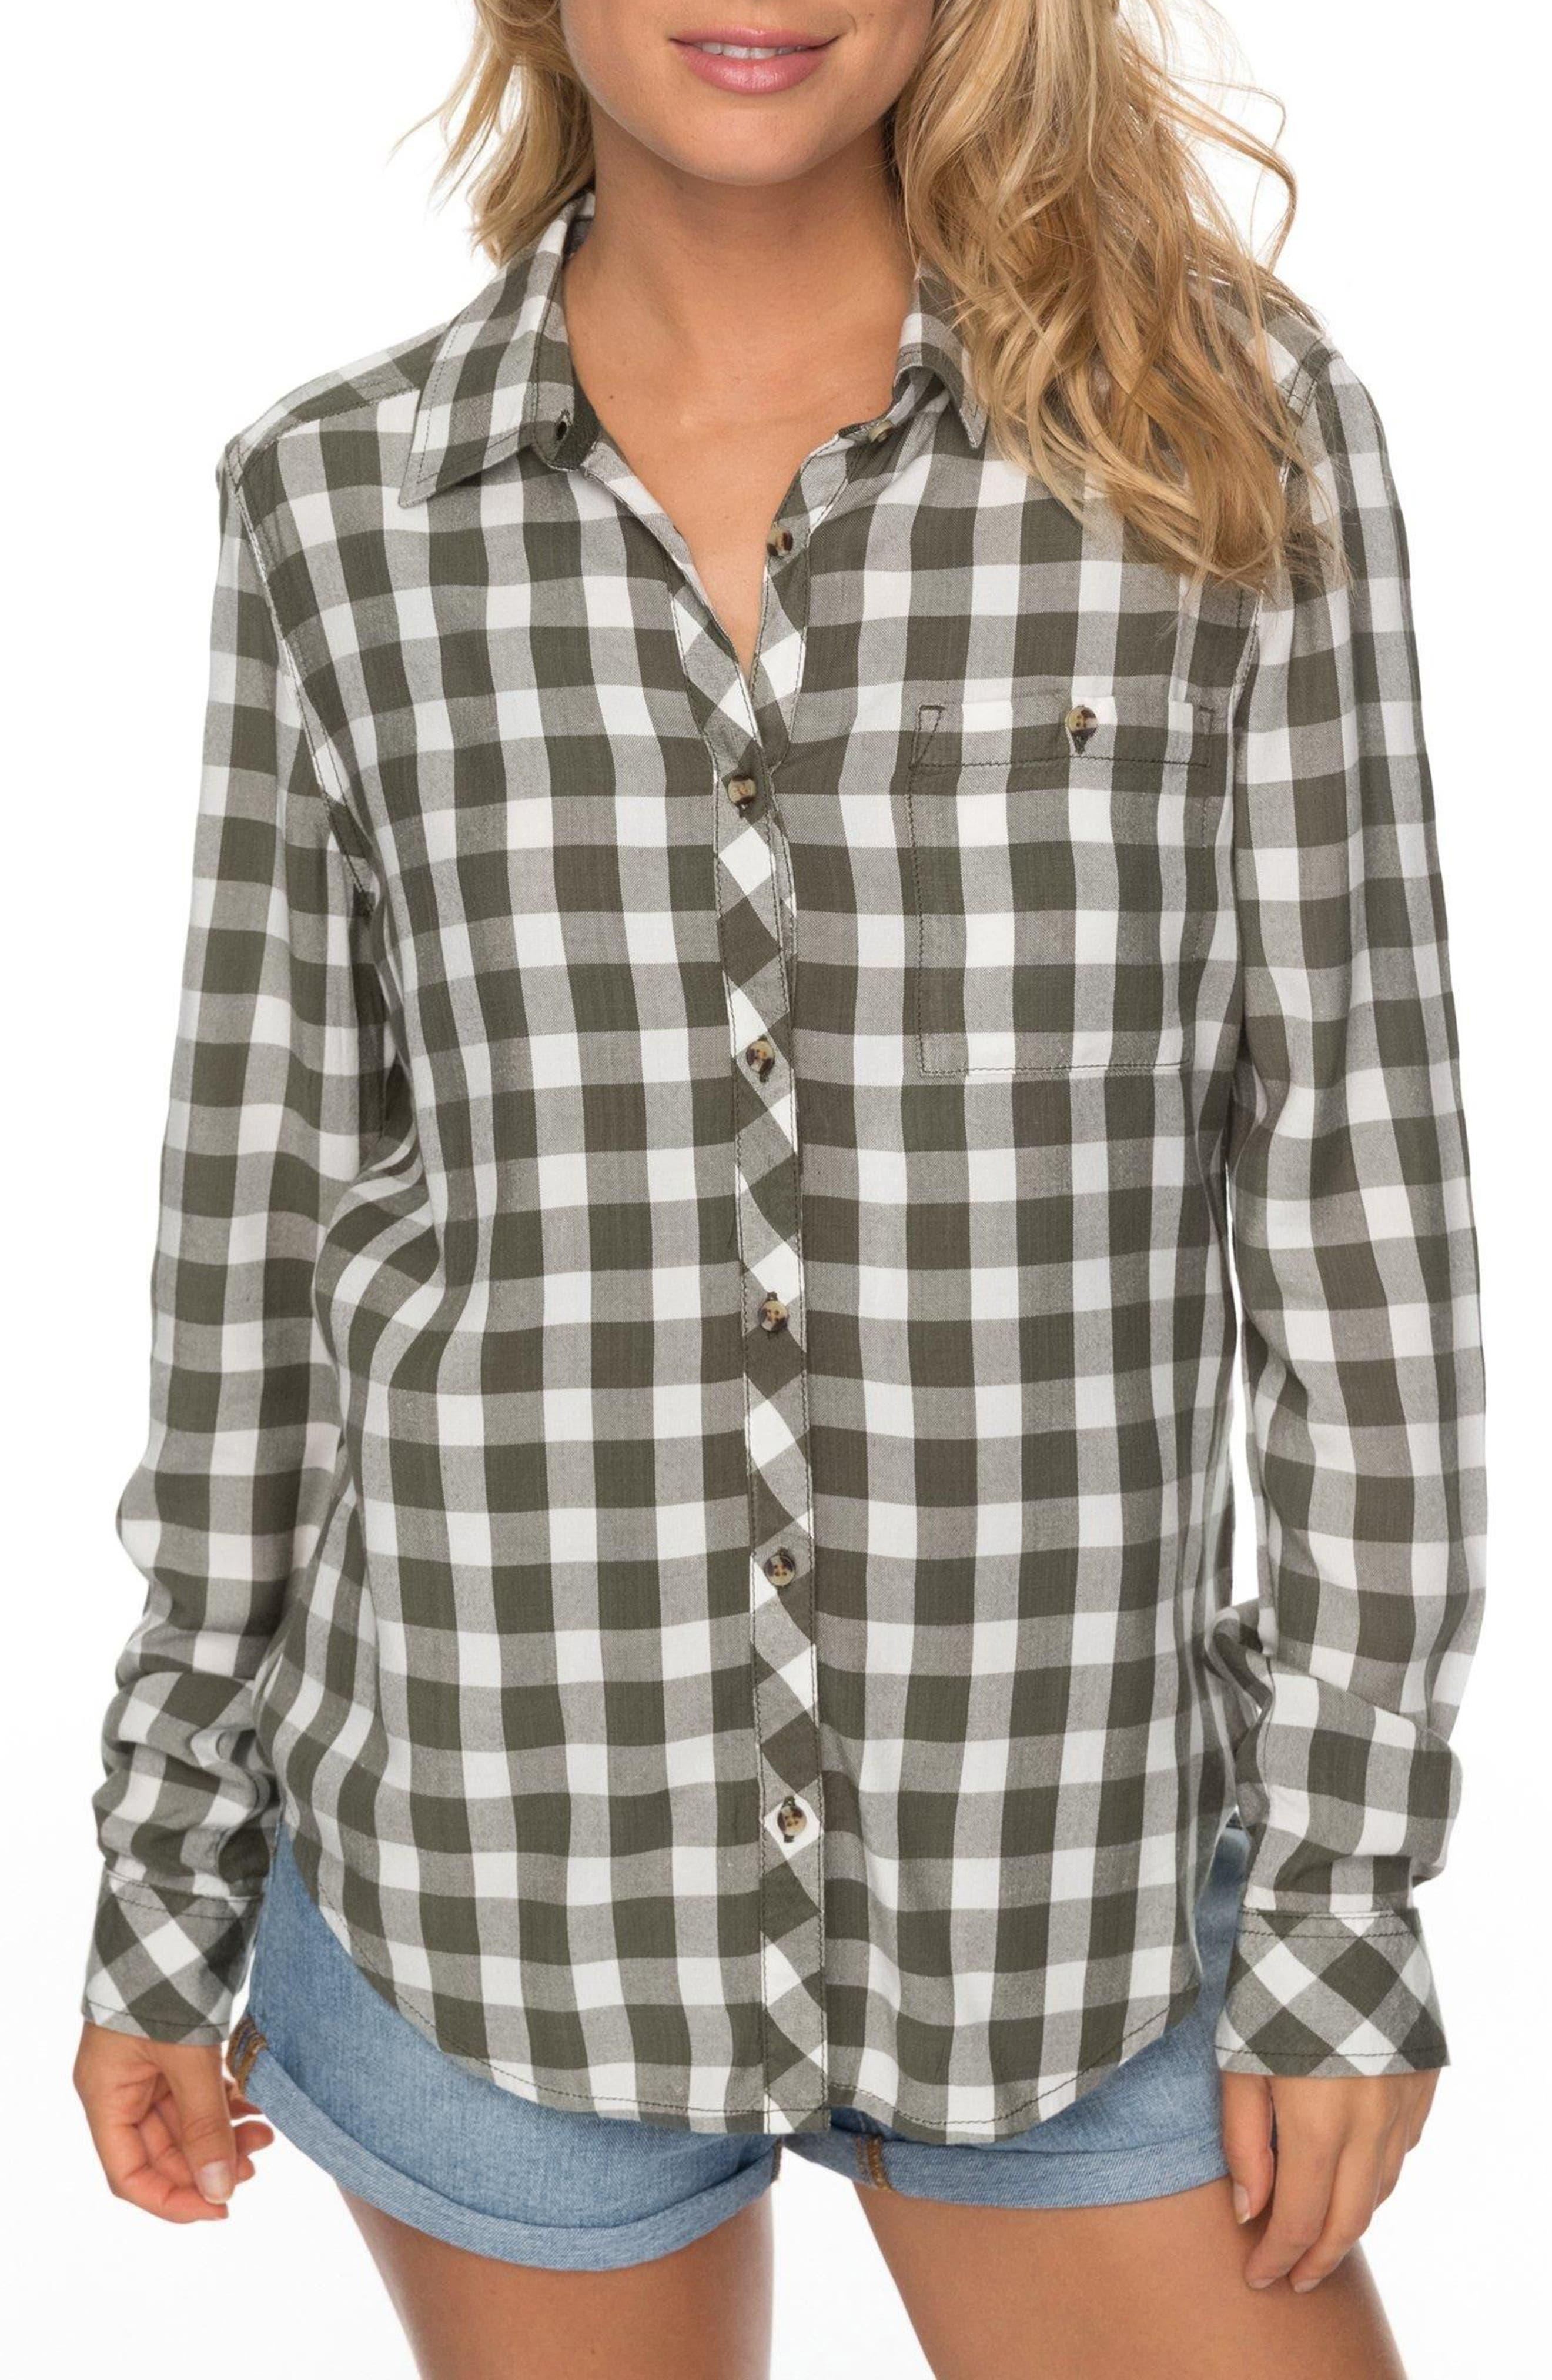 Roxy Capital Dream Check Shirt